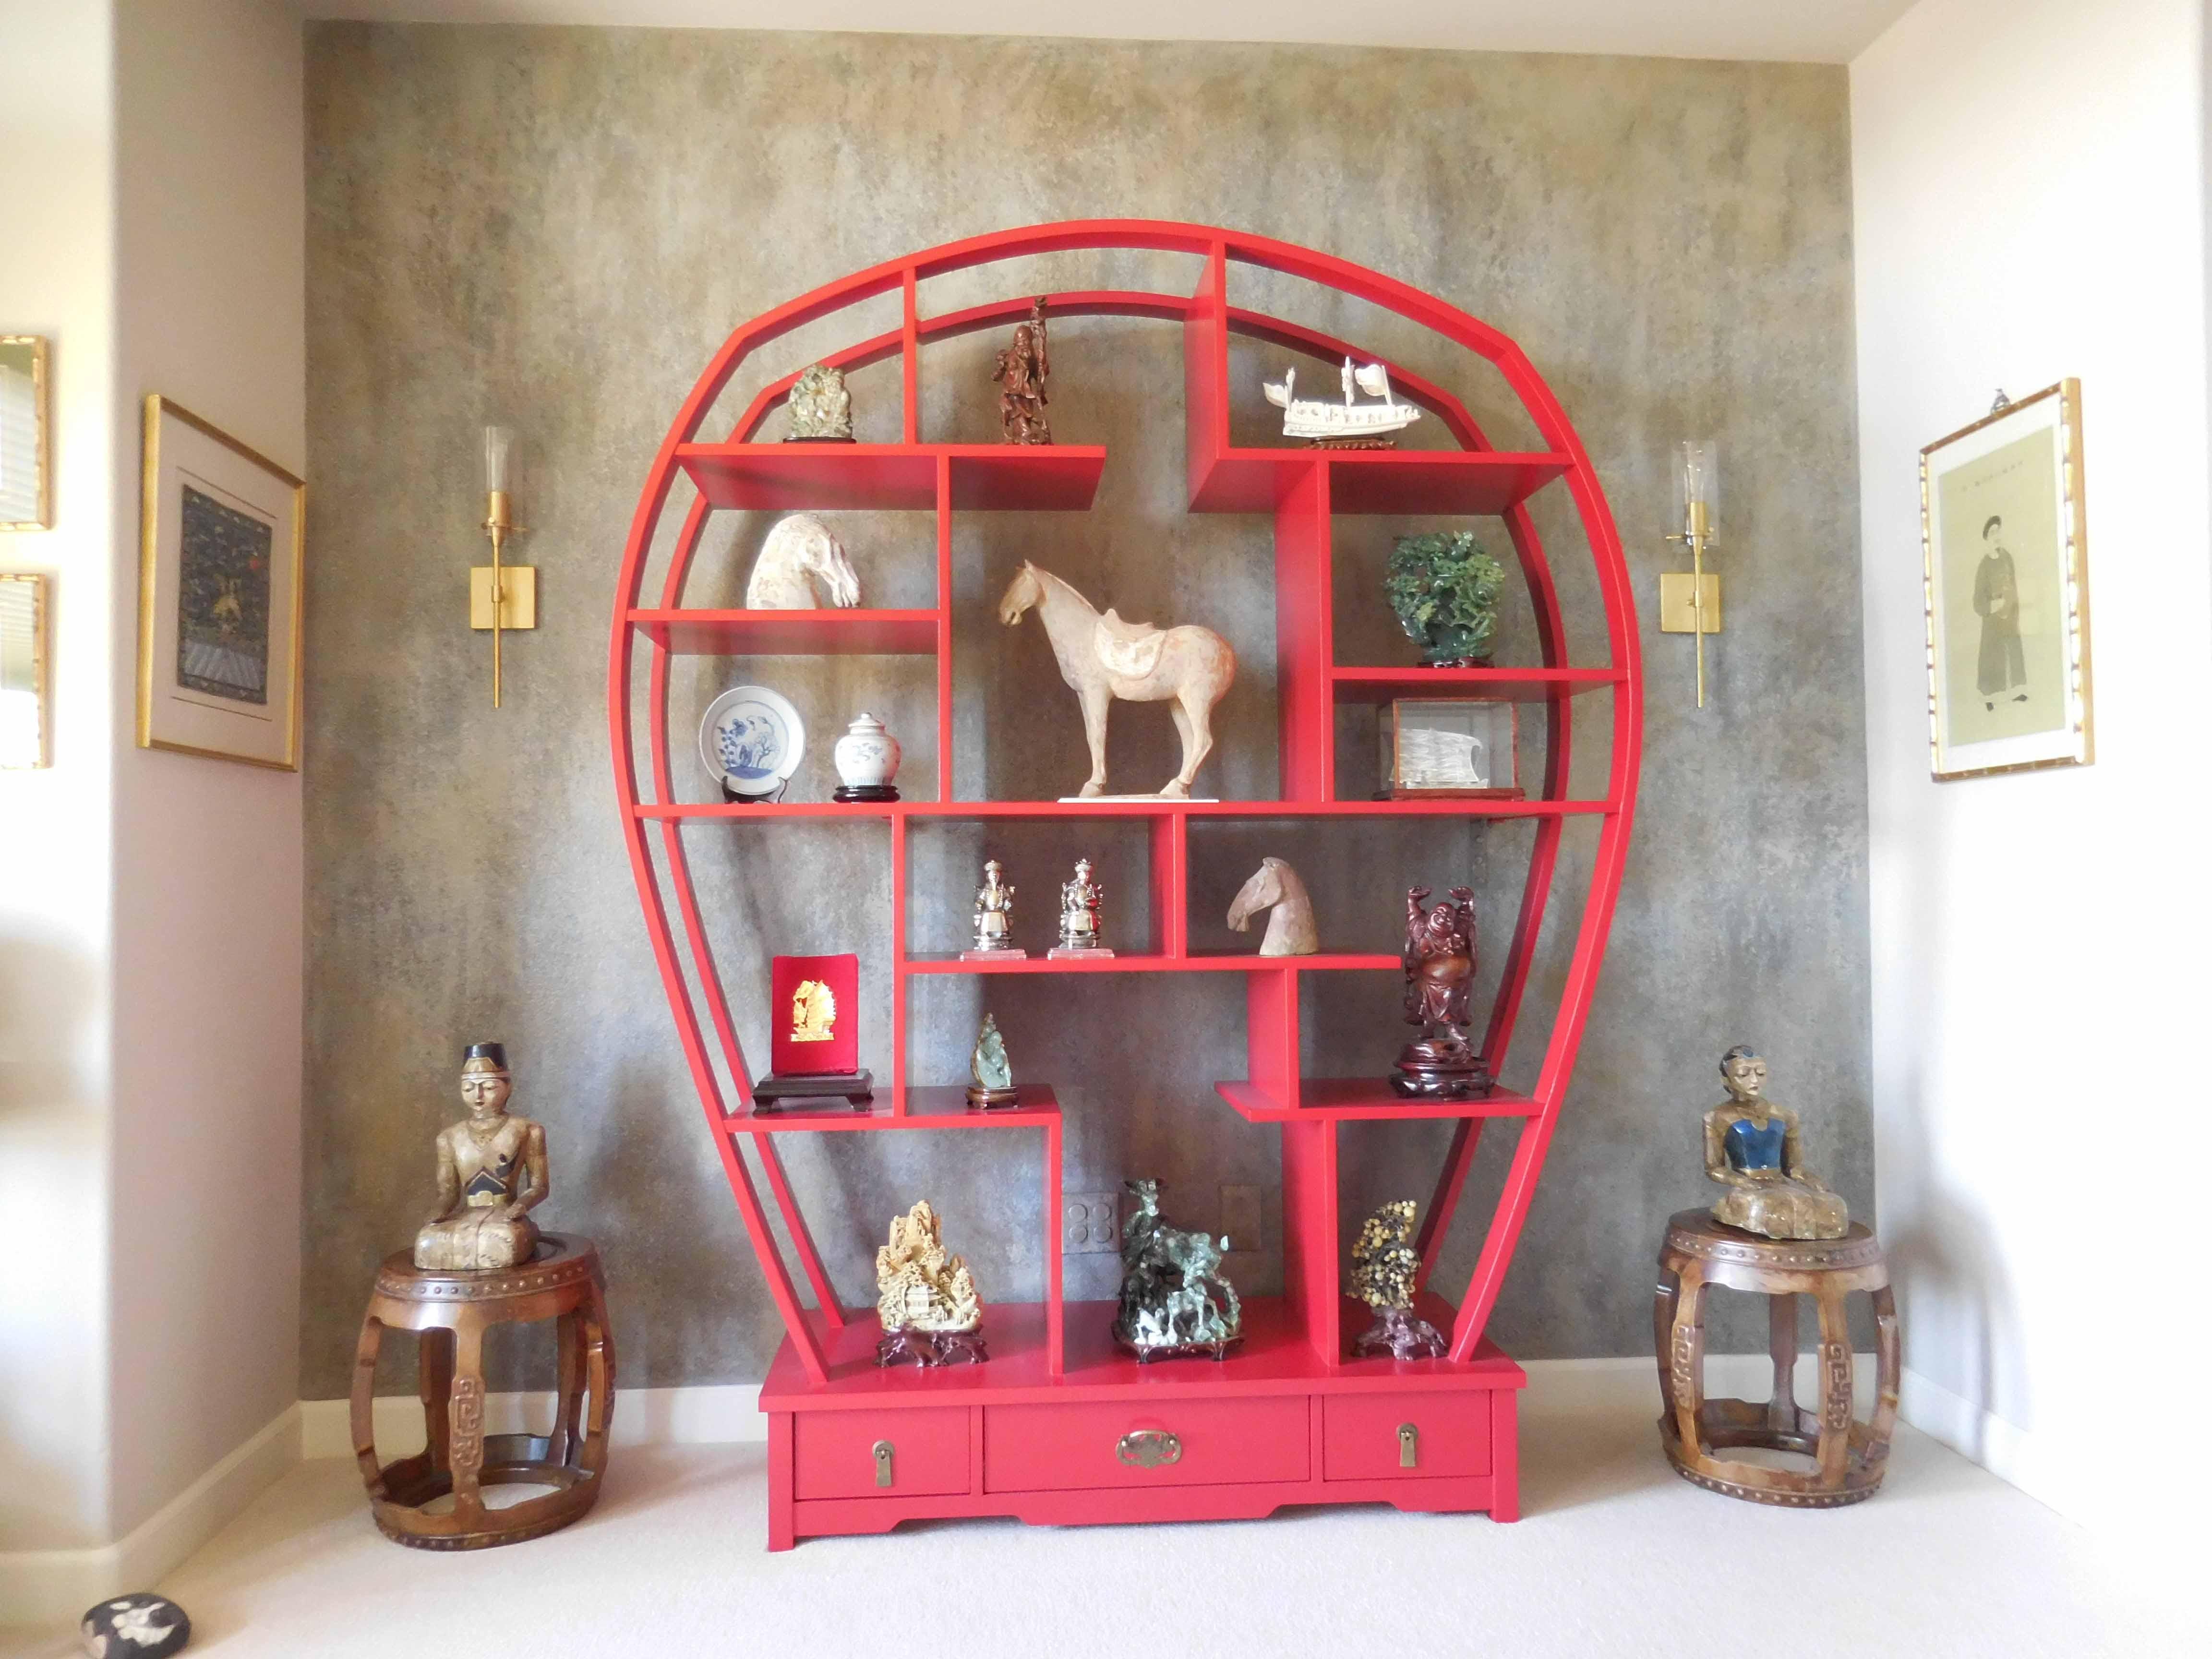 SculptureCabinet170614small